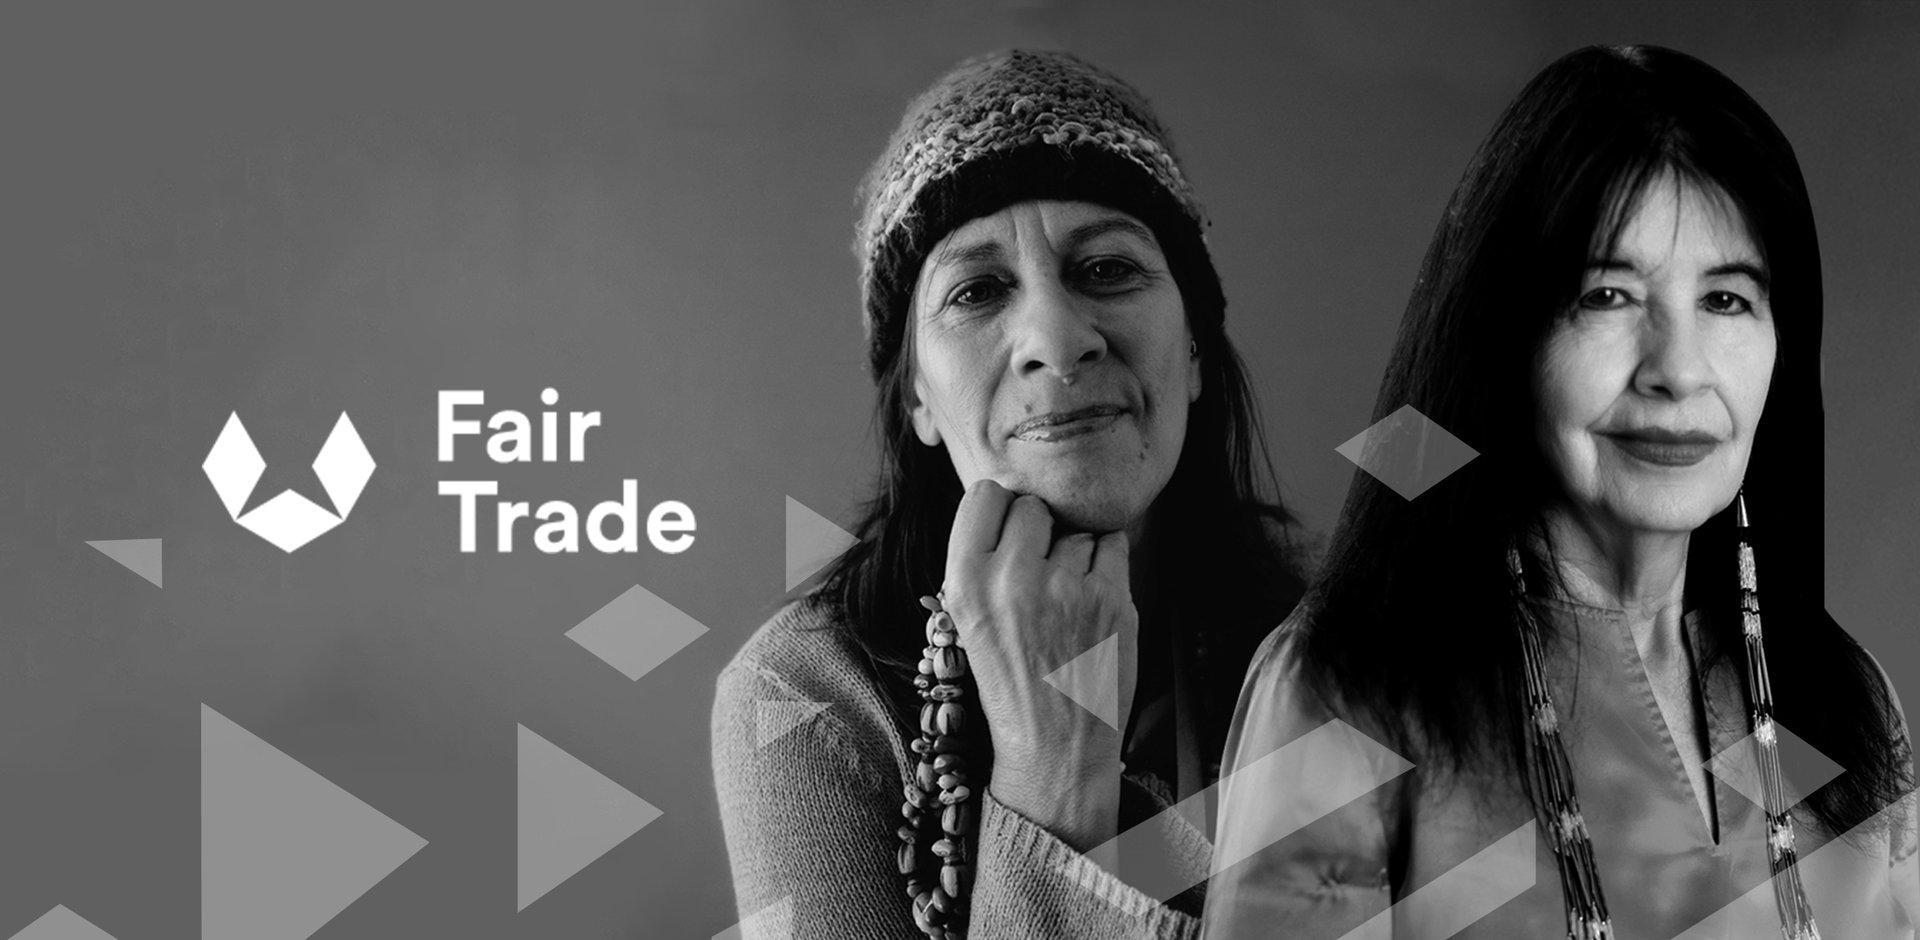 Fair Trade-Image-Red Room Poetry-Hoy Harjo and Ali Cobby Eckermann-Poets